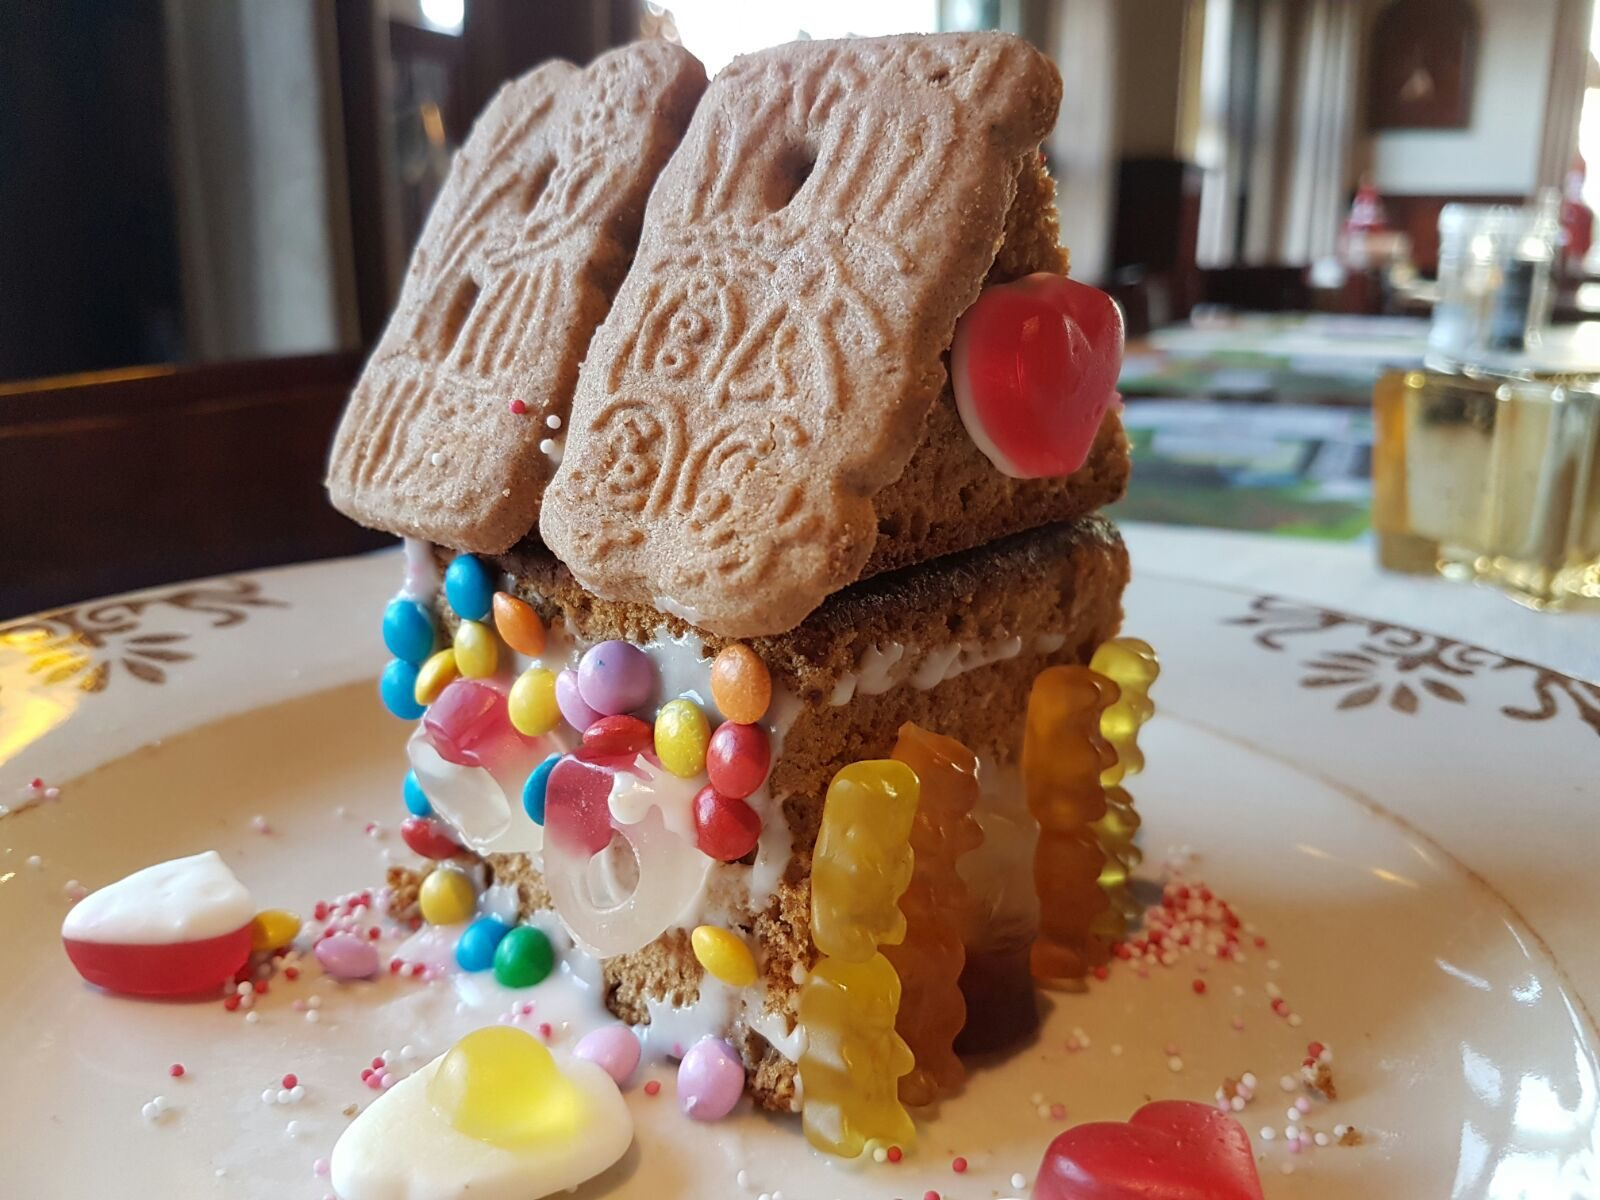 Snoephuisje maken met kinderfeestje in Voorthuizen